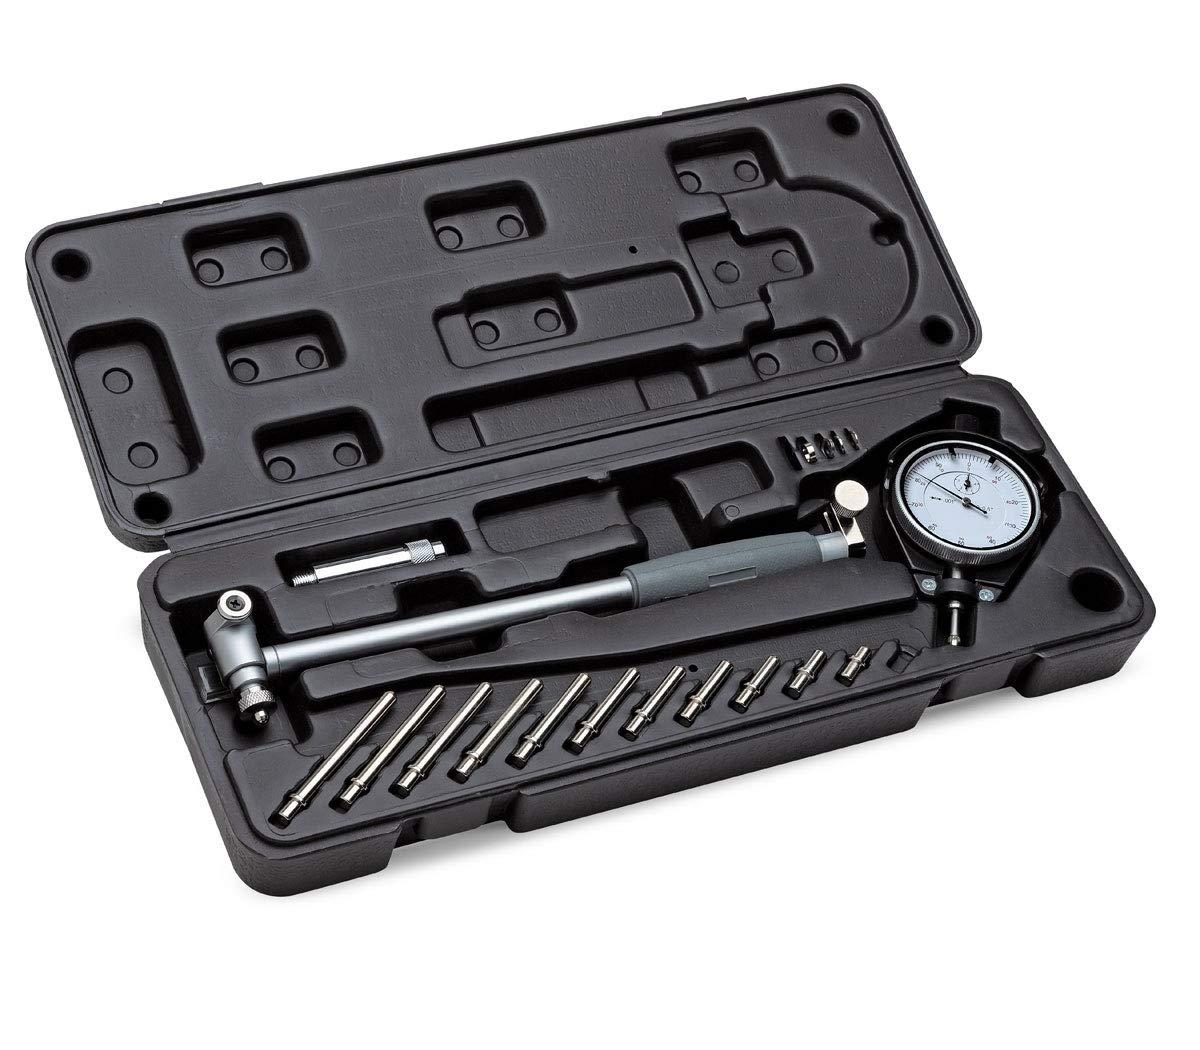 Eastwood Dial Type Cylinder Bore Gauge Kit 2-6 in. Range Measuring 0.01 Accuracy Diameter Indicator Tool Kit